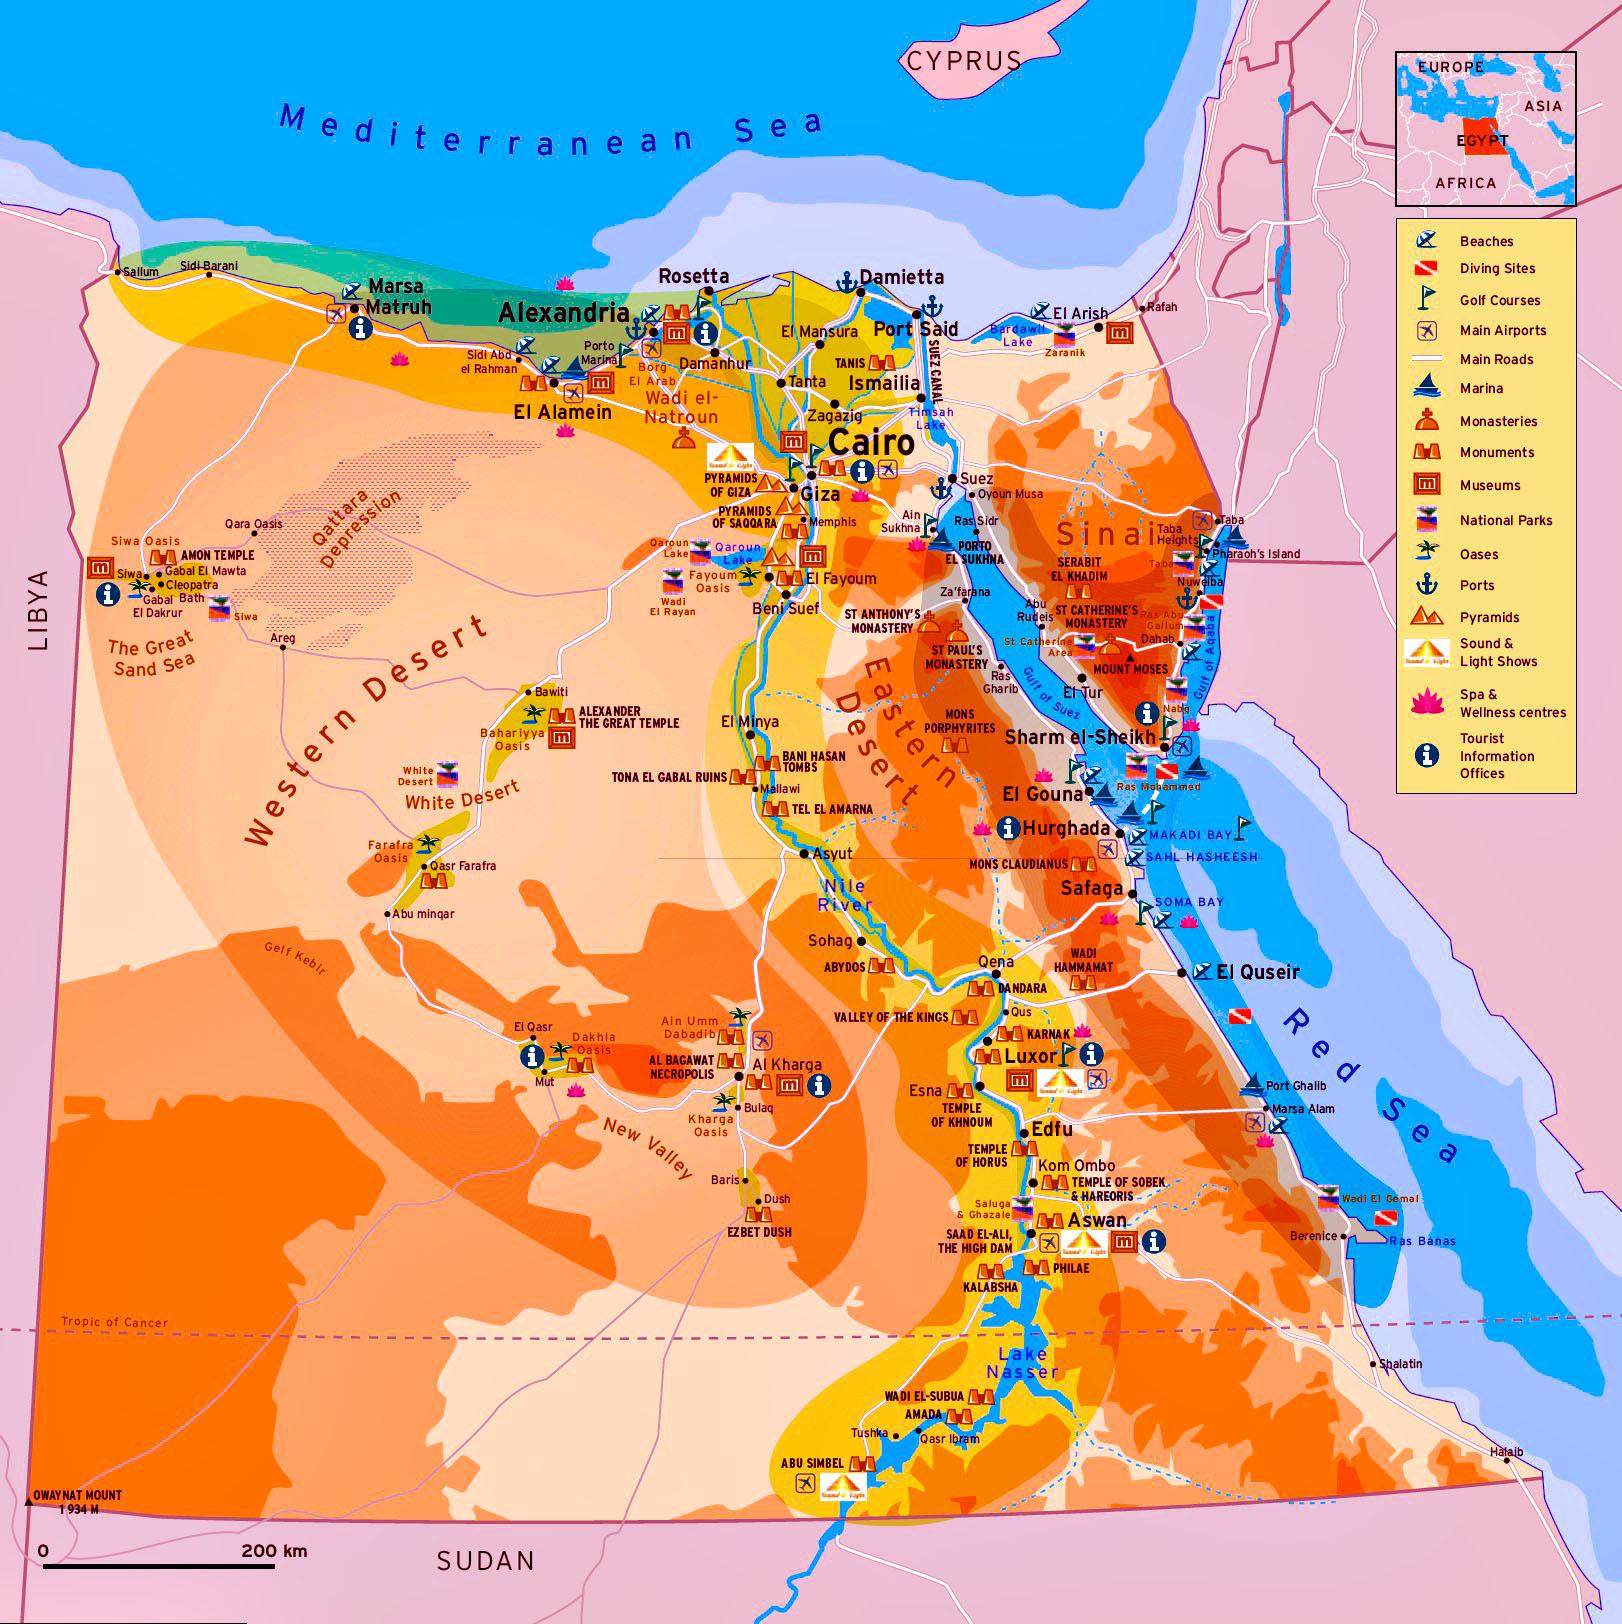 география египта картинки муки